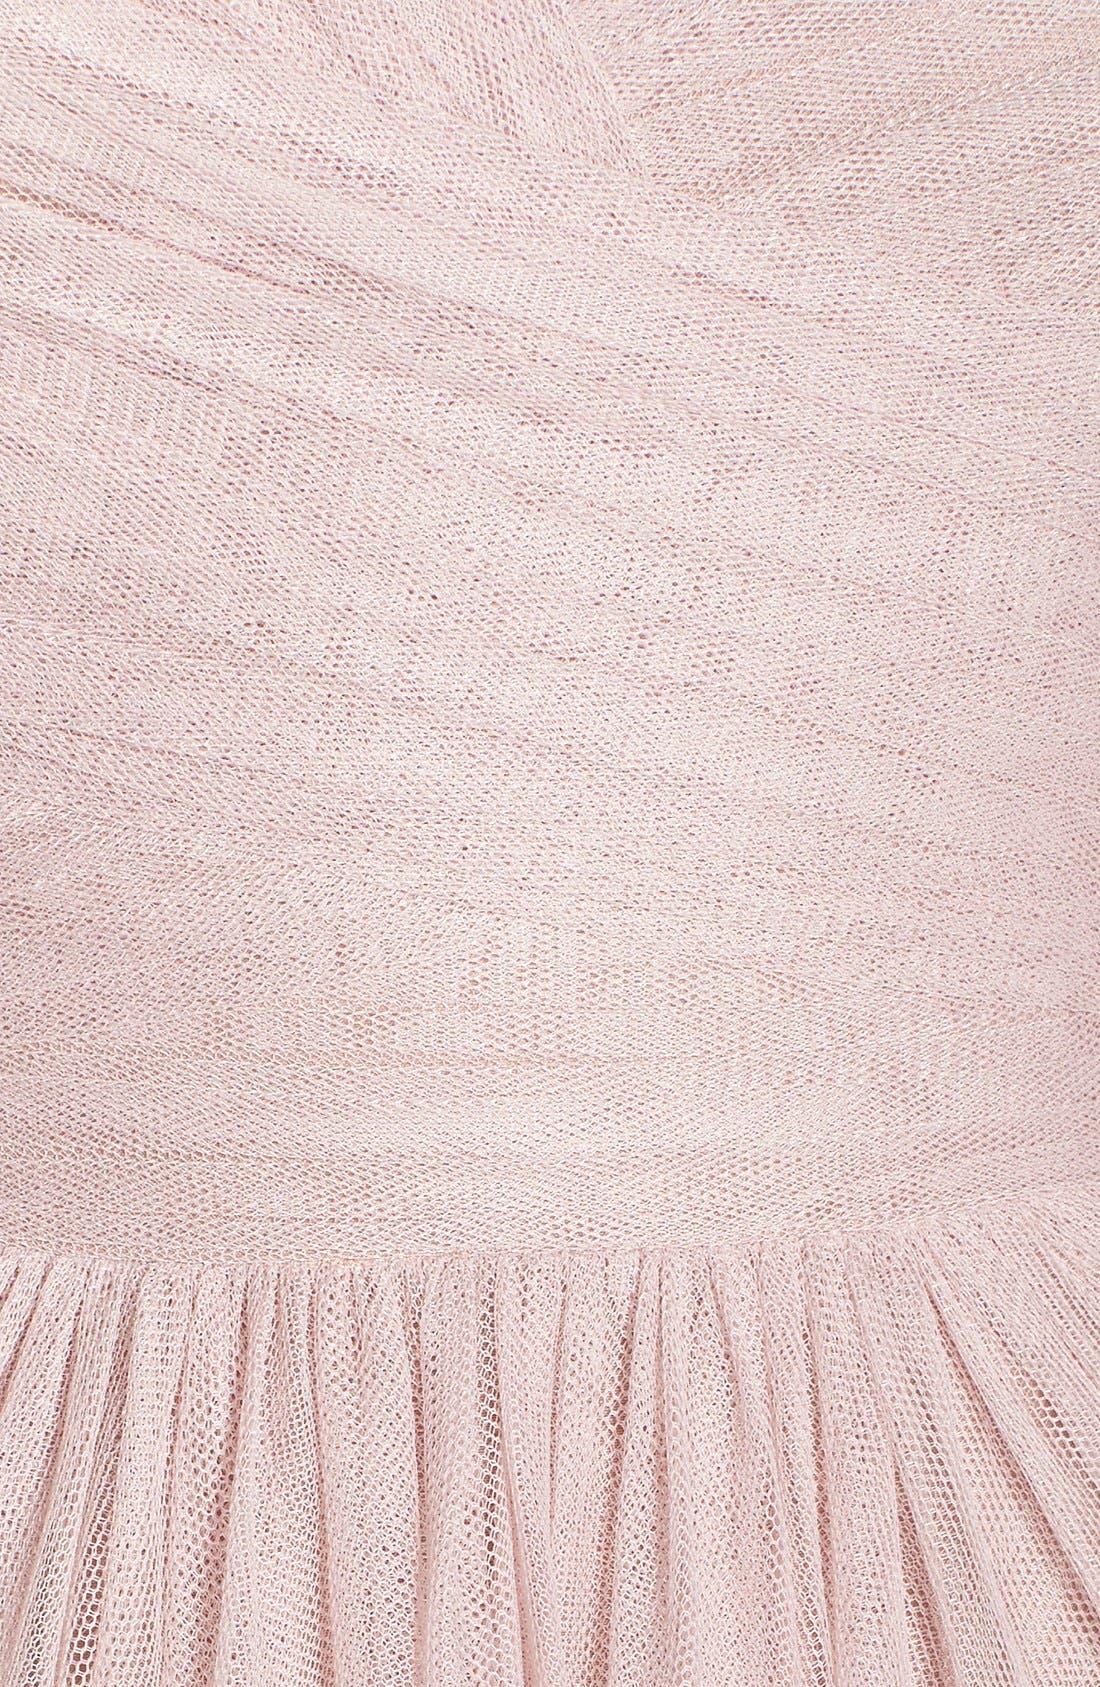 Alternate Image 5  - Monique Lhuillier Bridesmaids Sleeveless V-Neck Tulle Gown